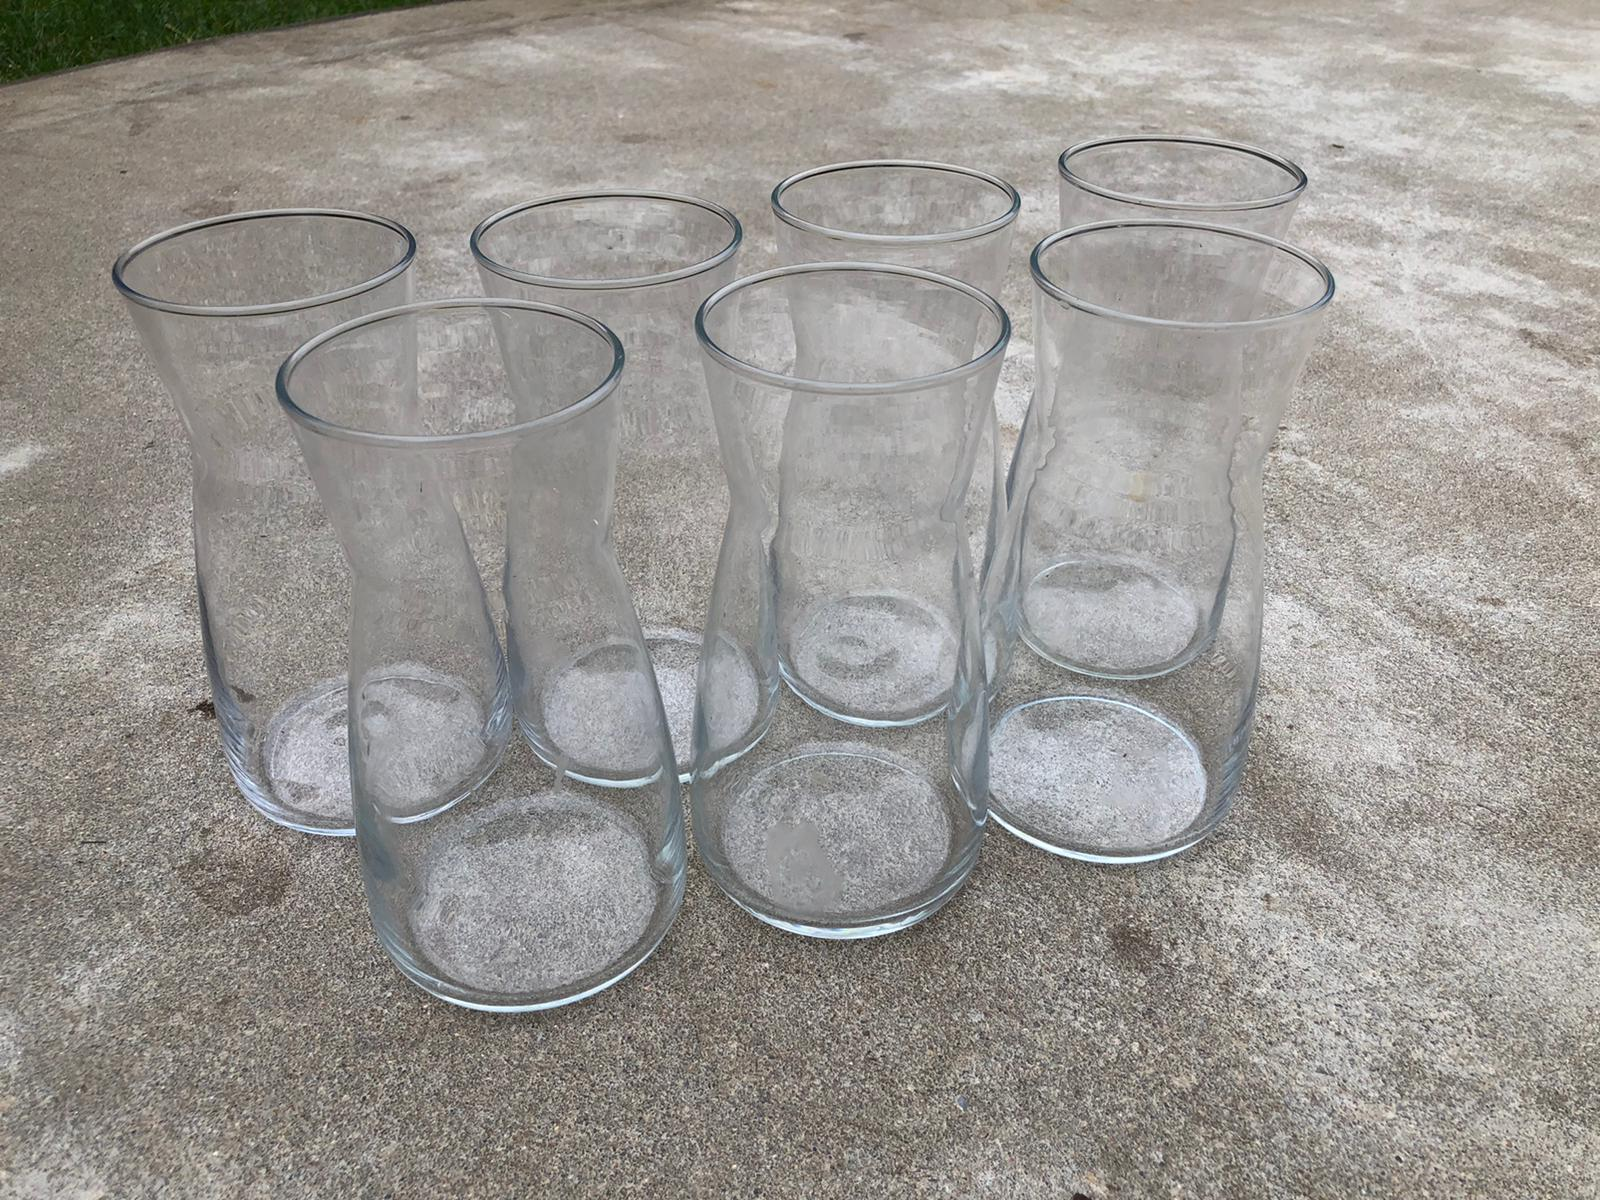 Karafy na vodu 1,0 l - Obrázek č. 1